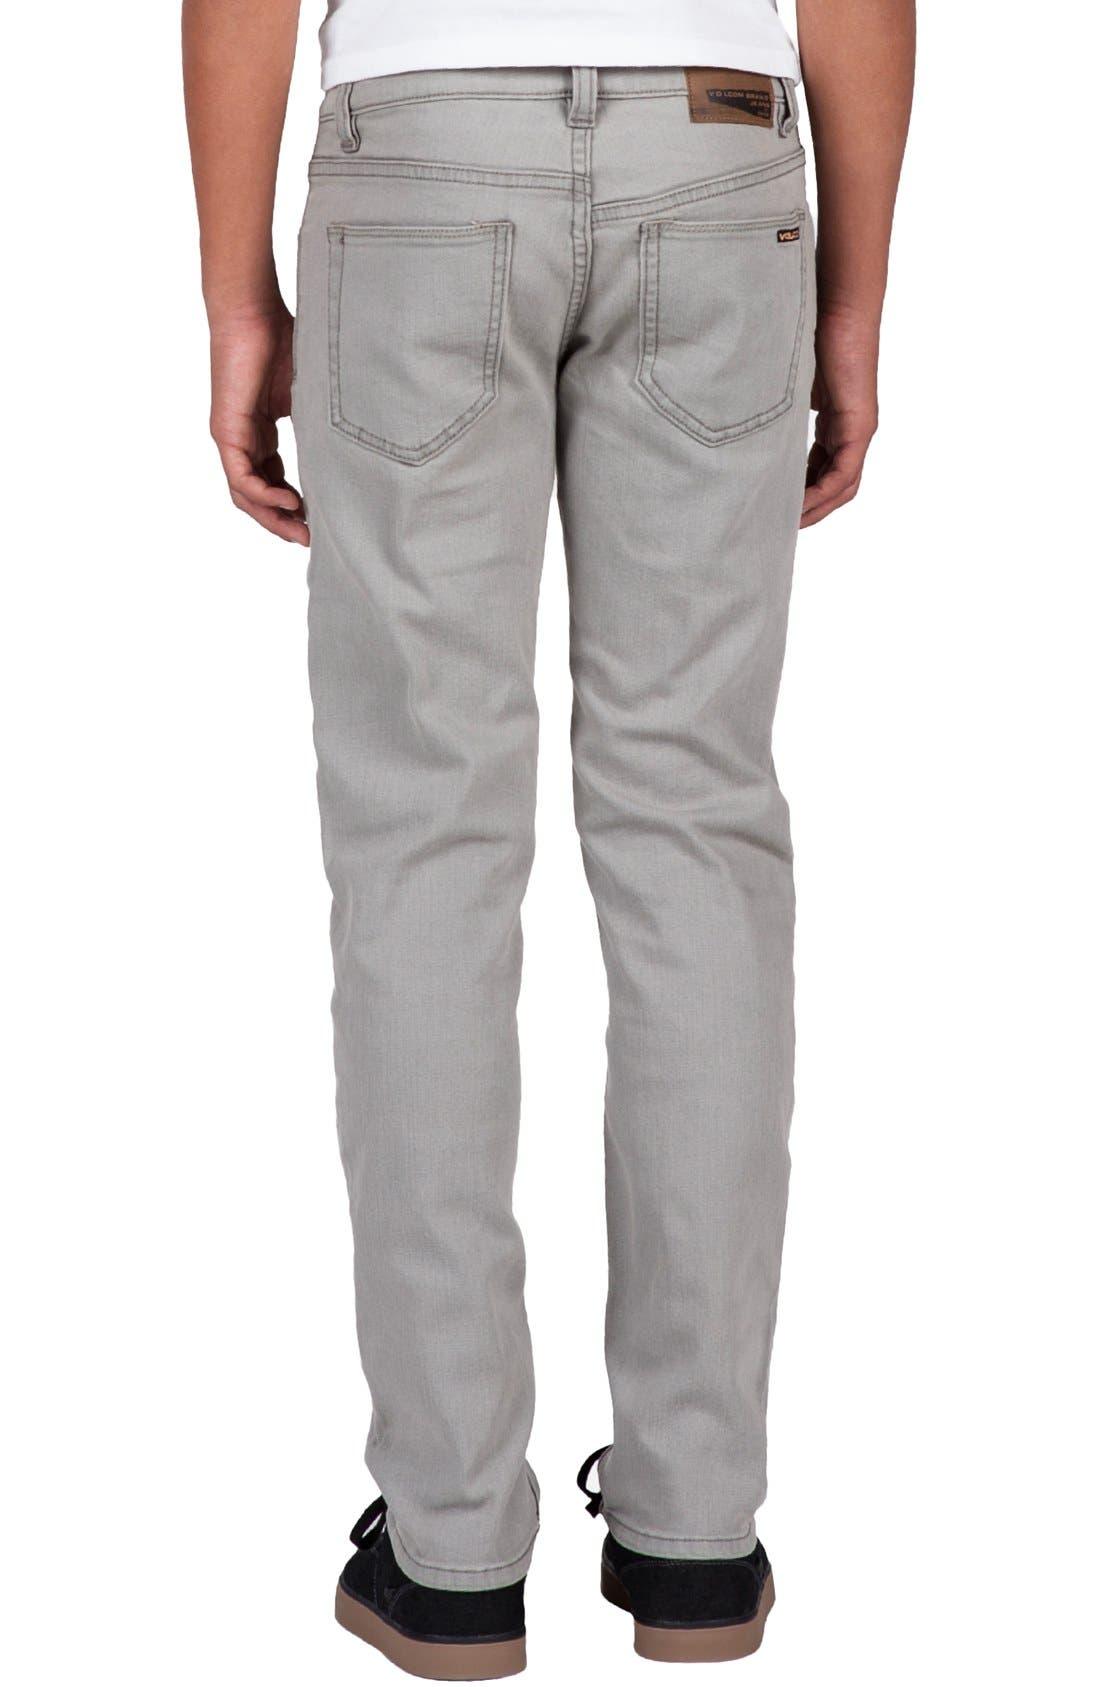 'Solver' Straight Leg Denim Jeans,                             Alternate thumbnail 2, color,                             Old Grey